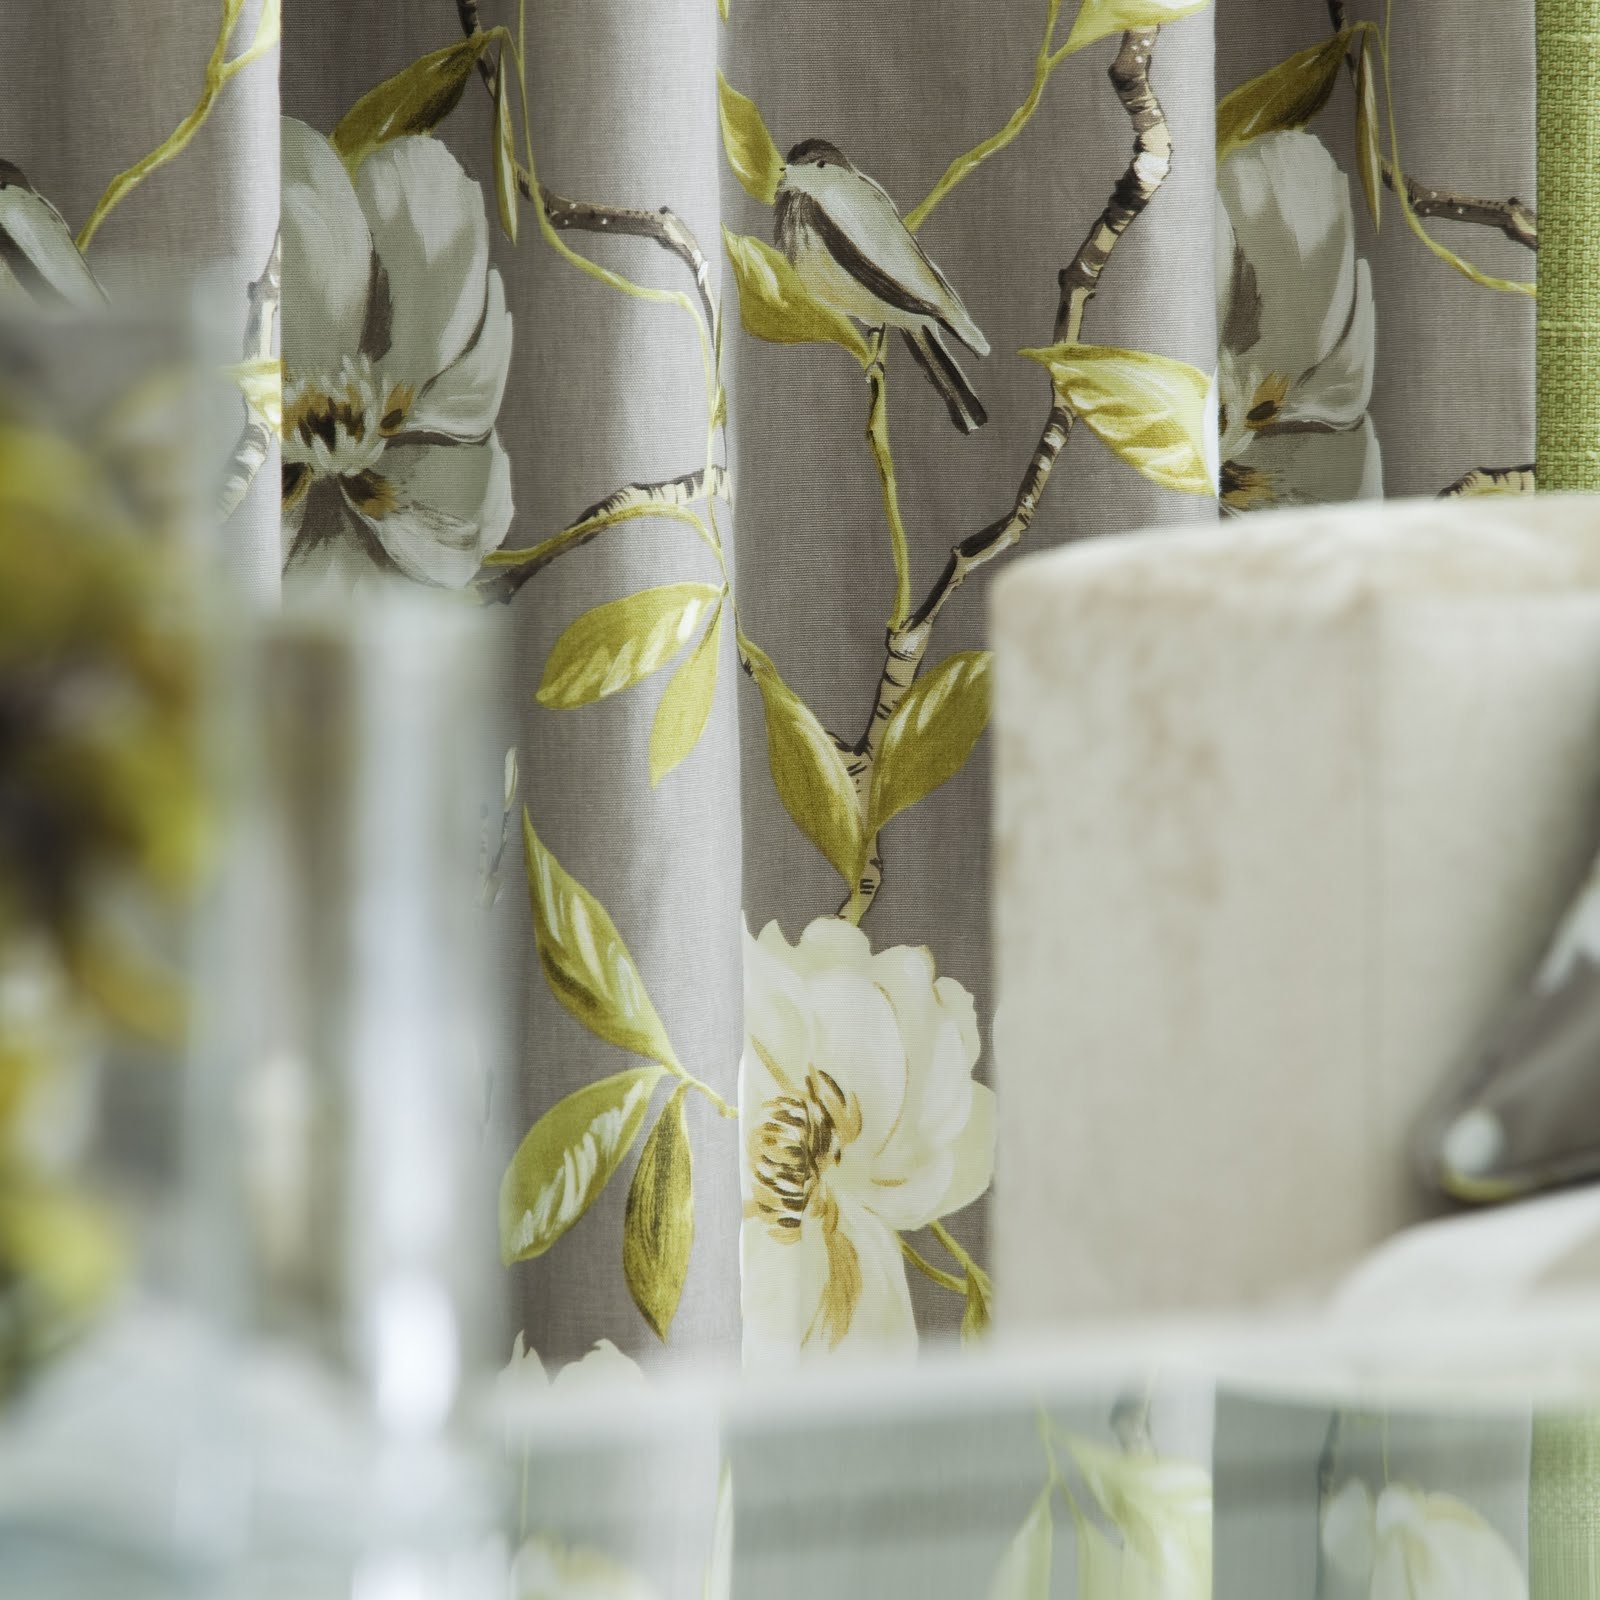 http://1.bp.blogspot.com/_2l6usBCwqa8/S7xJCXWFhlI/AAAAAAAAAMA/Ku2ufSFx4C4/s1600/Interiors+Trend+-+Imperial+by+Prestigious+Textiles.jpg